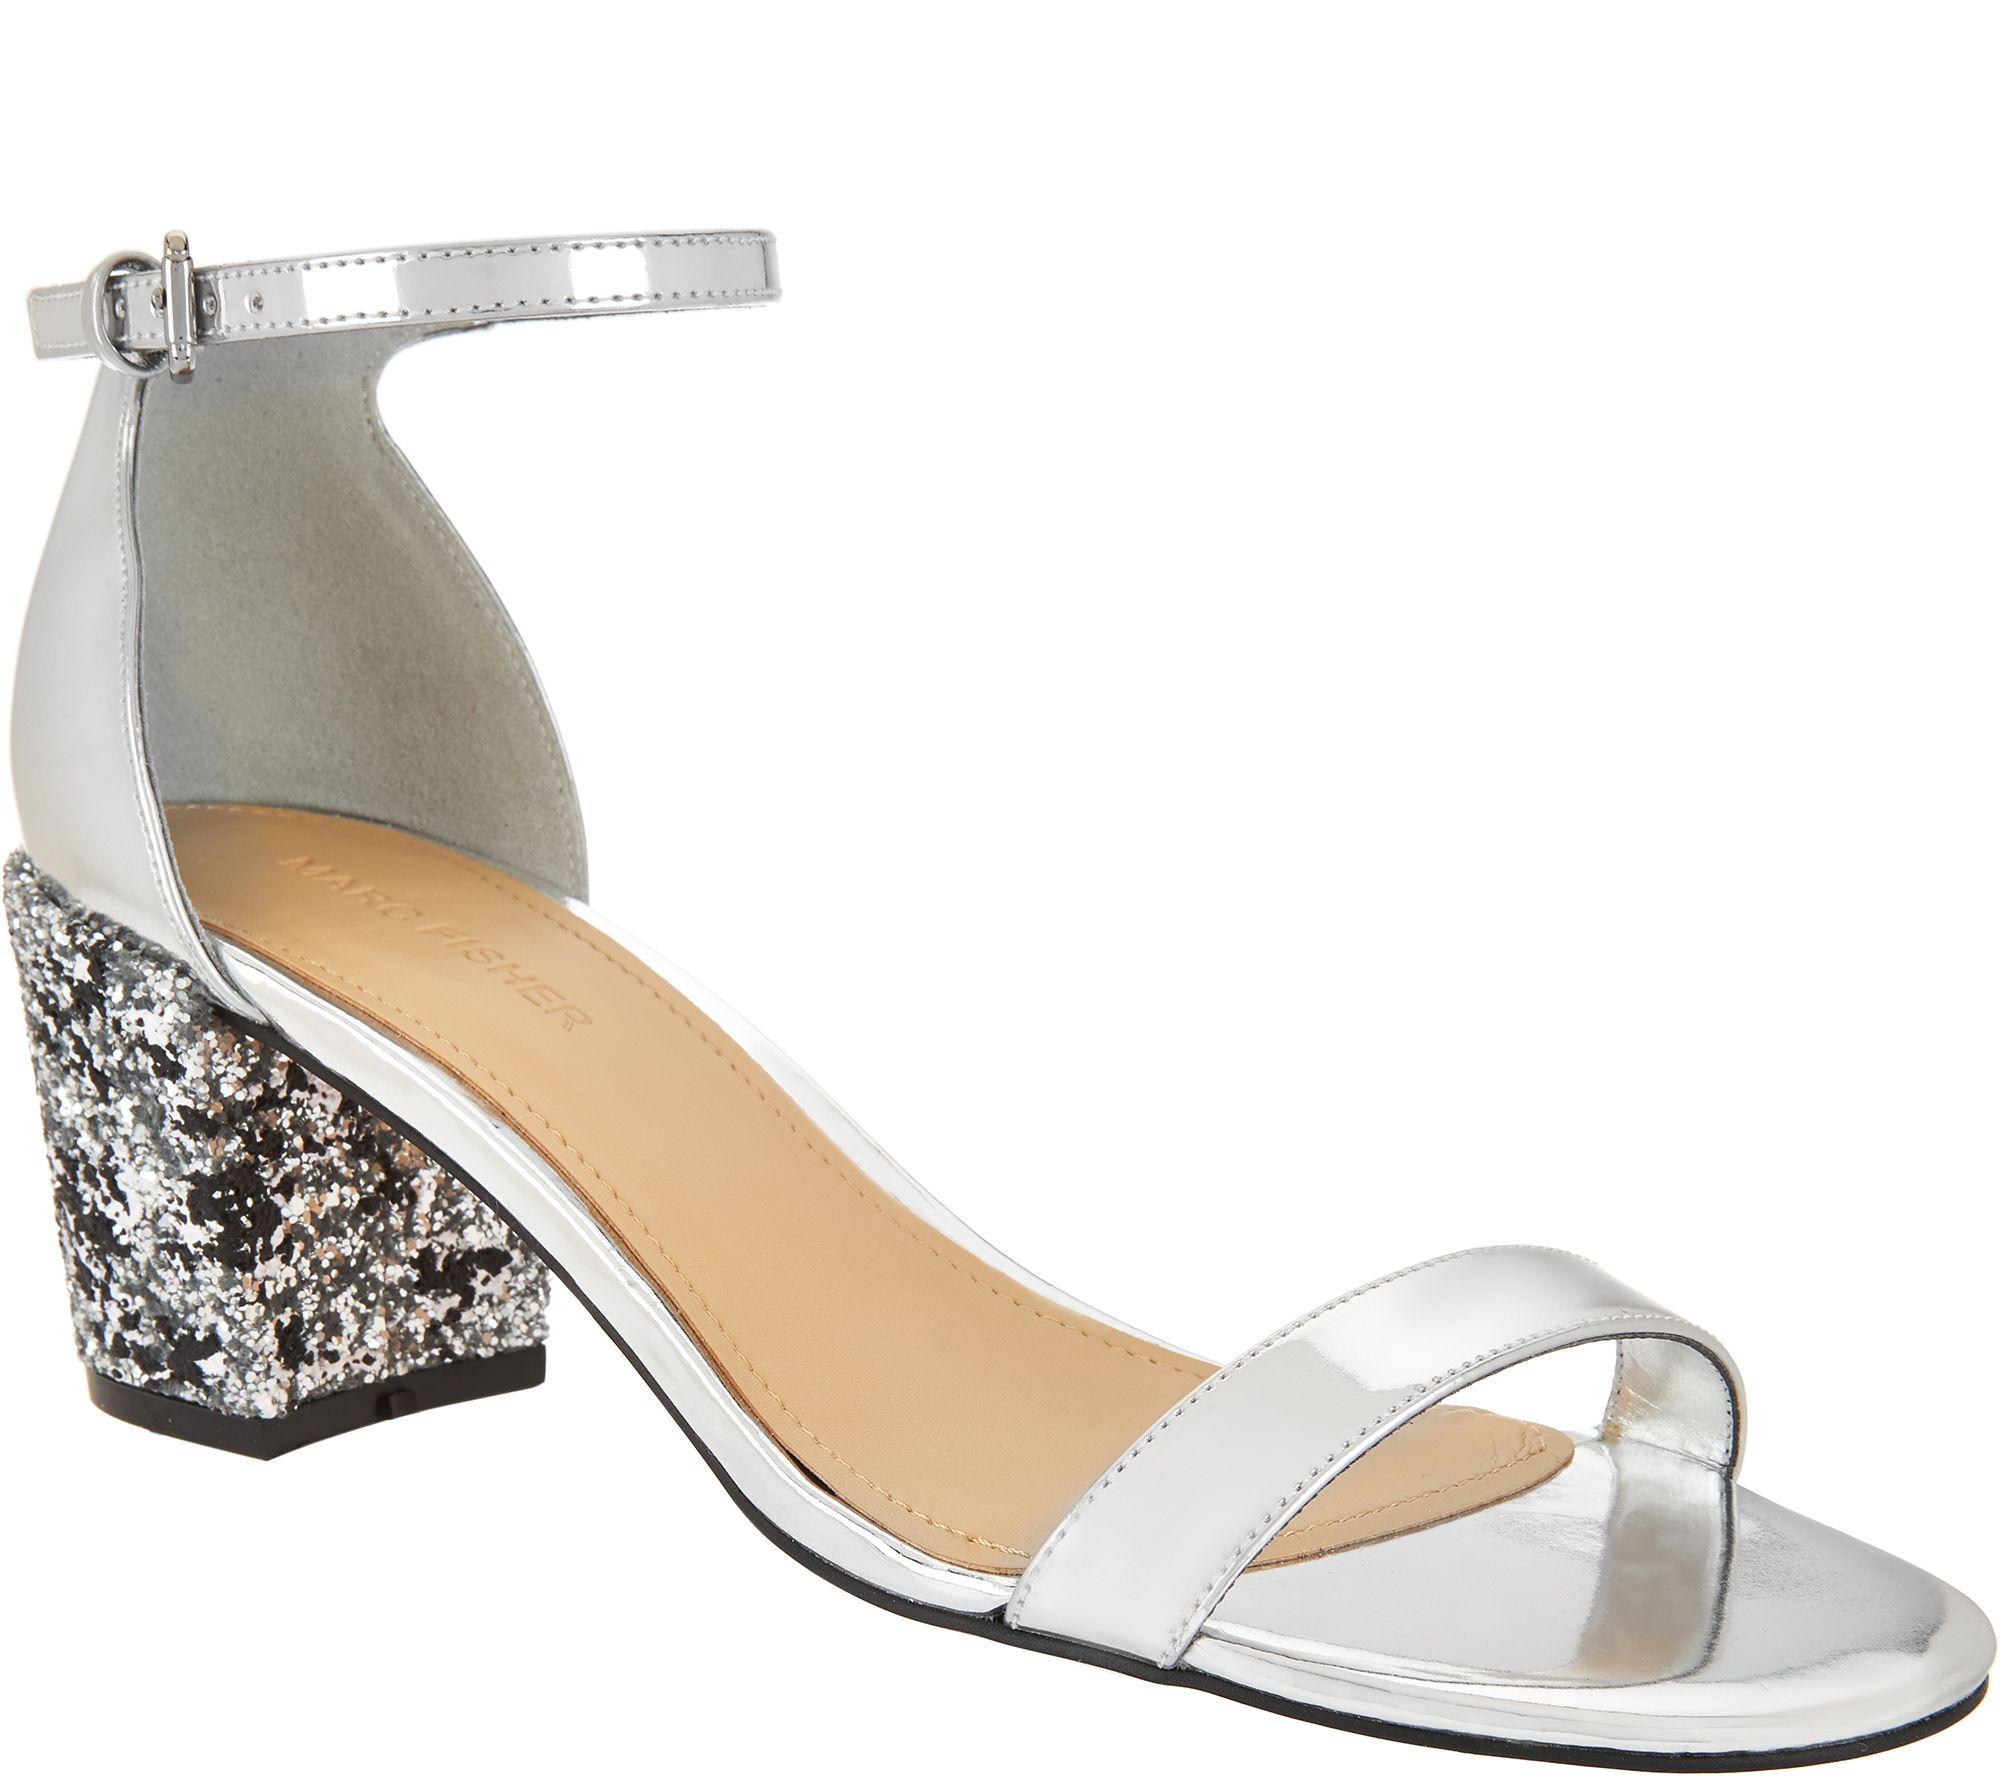 95179a8a0037f0 Marc Fisher Glitter and Patent Block Heel Sandals - Safia — QVC.com